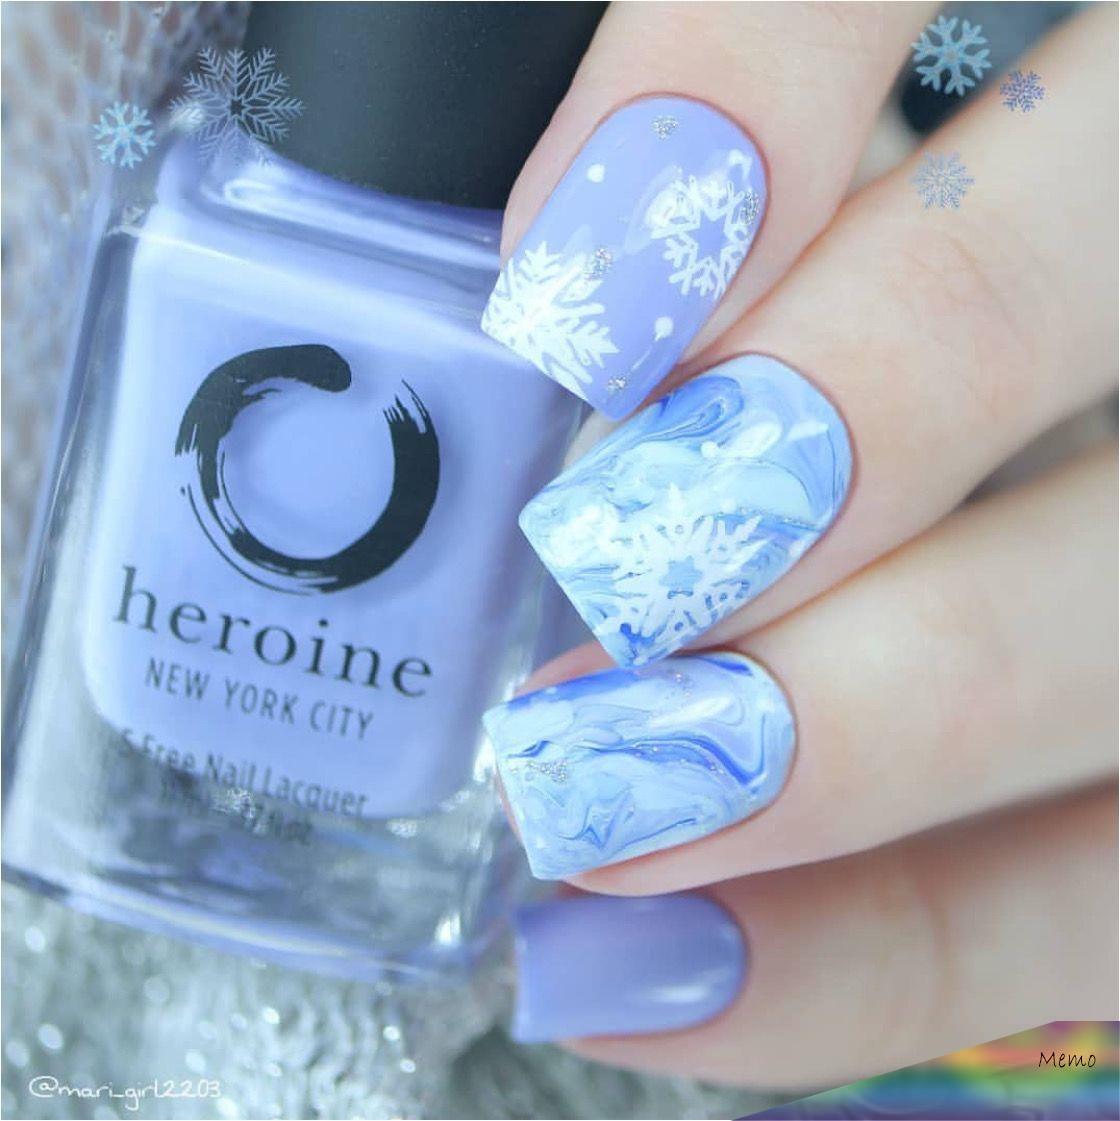 Dec 4, 2019 vegan & crueltyfree nail polish by heroine